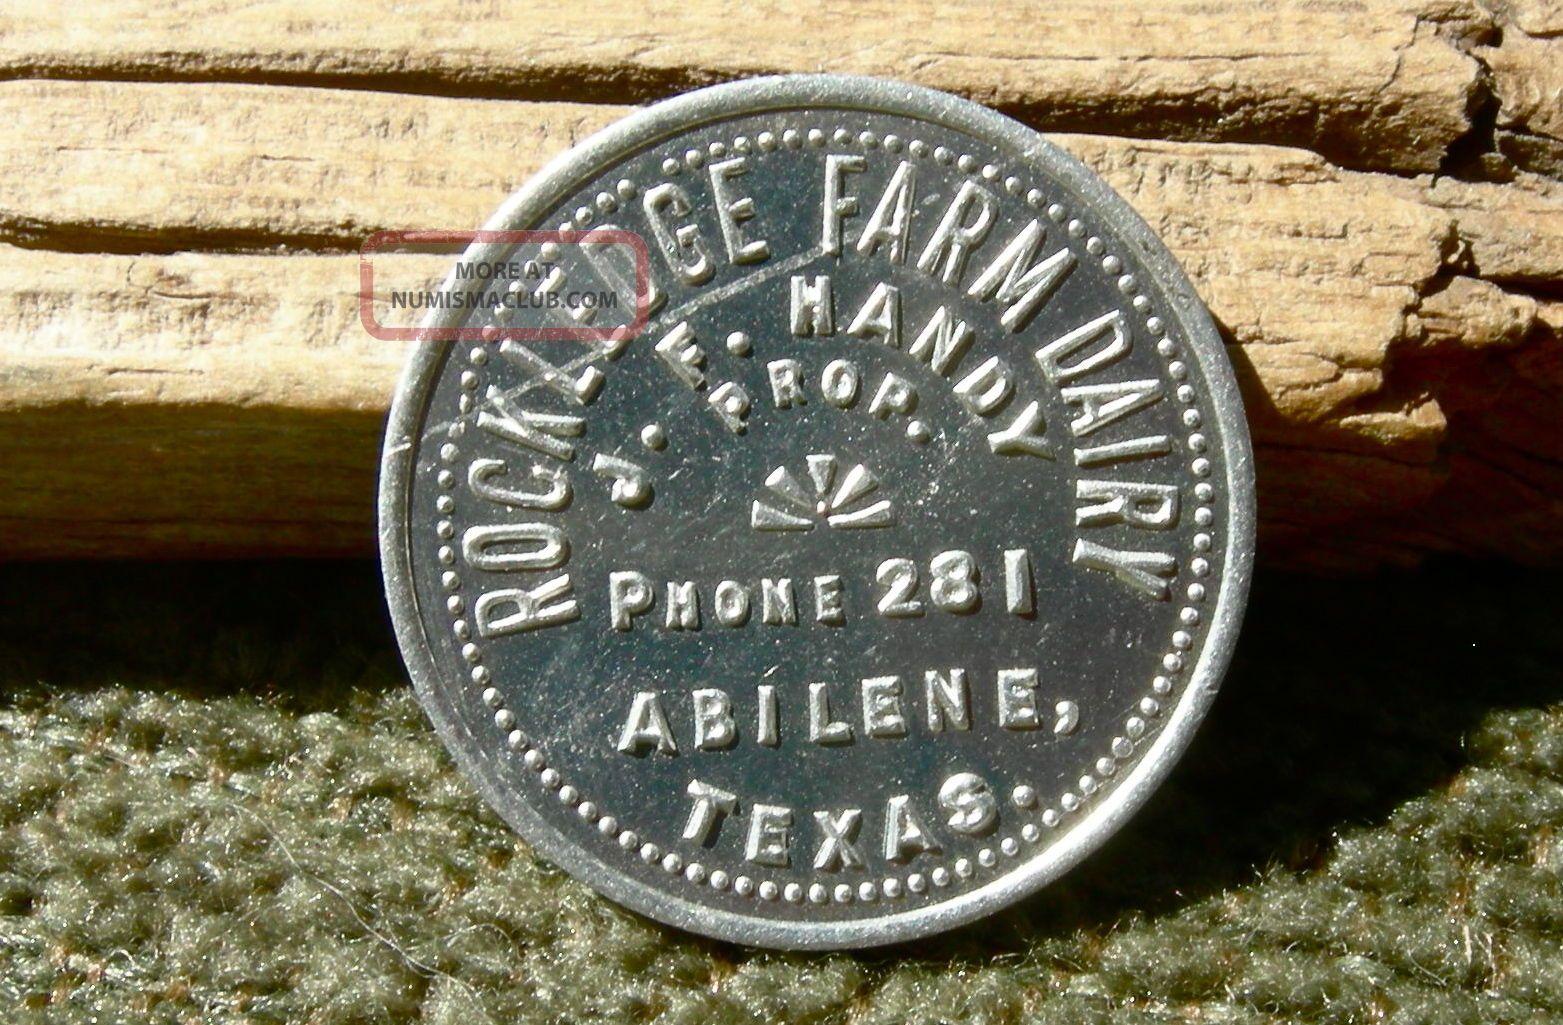 1900s Abilene Texas Tx (taylor & Jones) Rockledge Farm Dairy Jf Handy Prop Token Exonumia photo